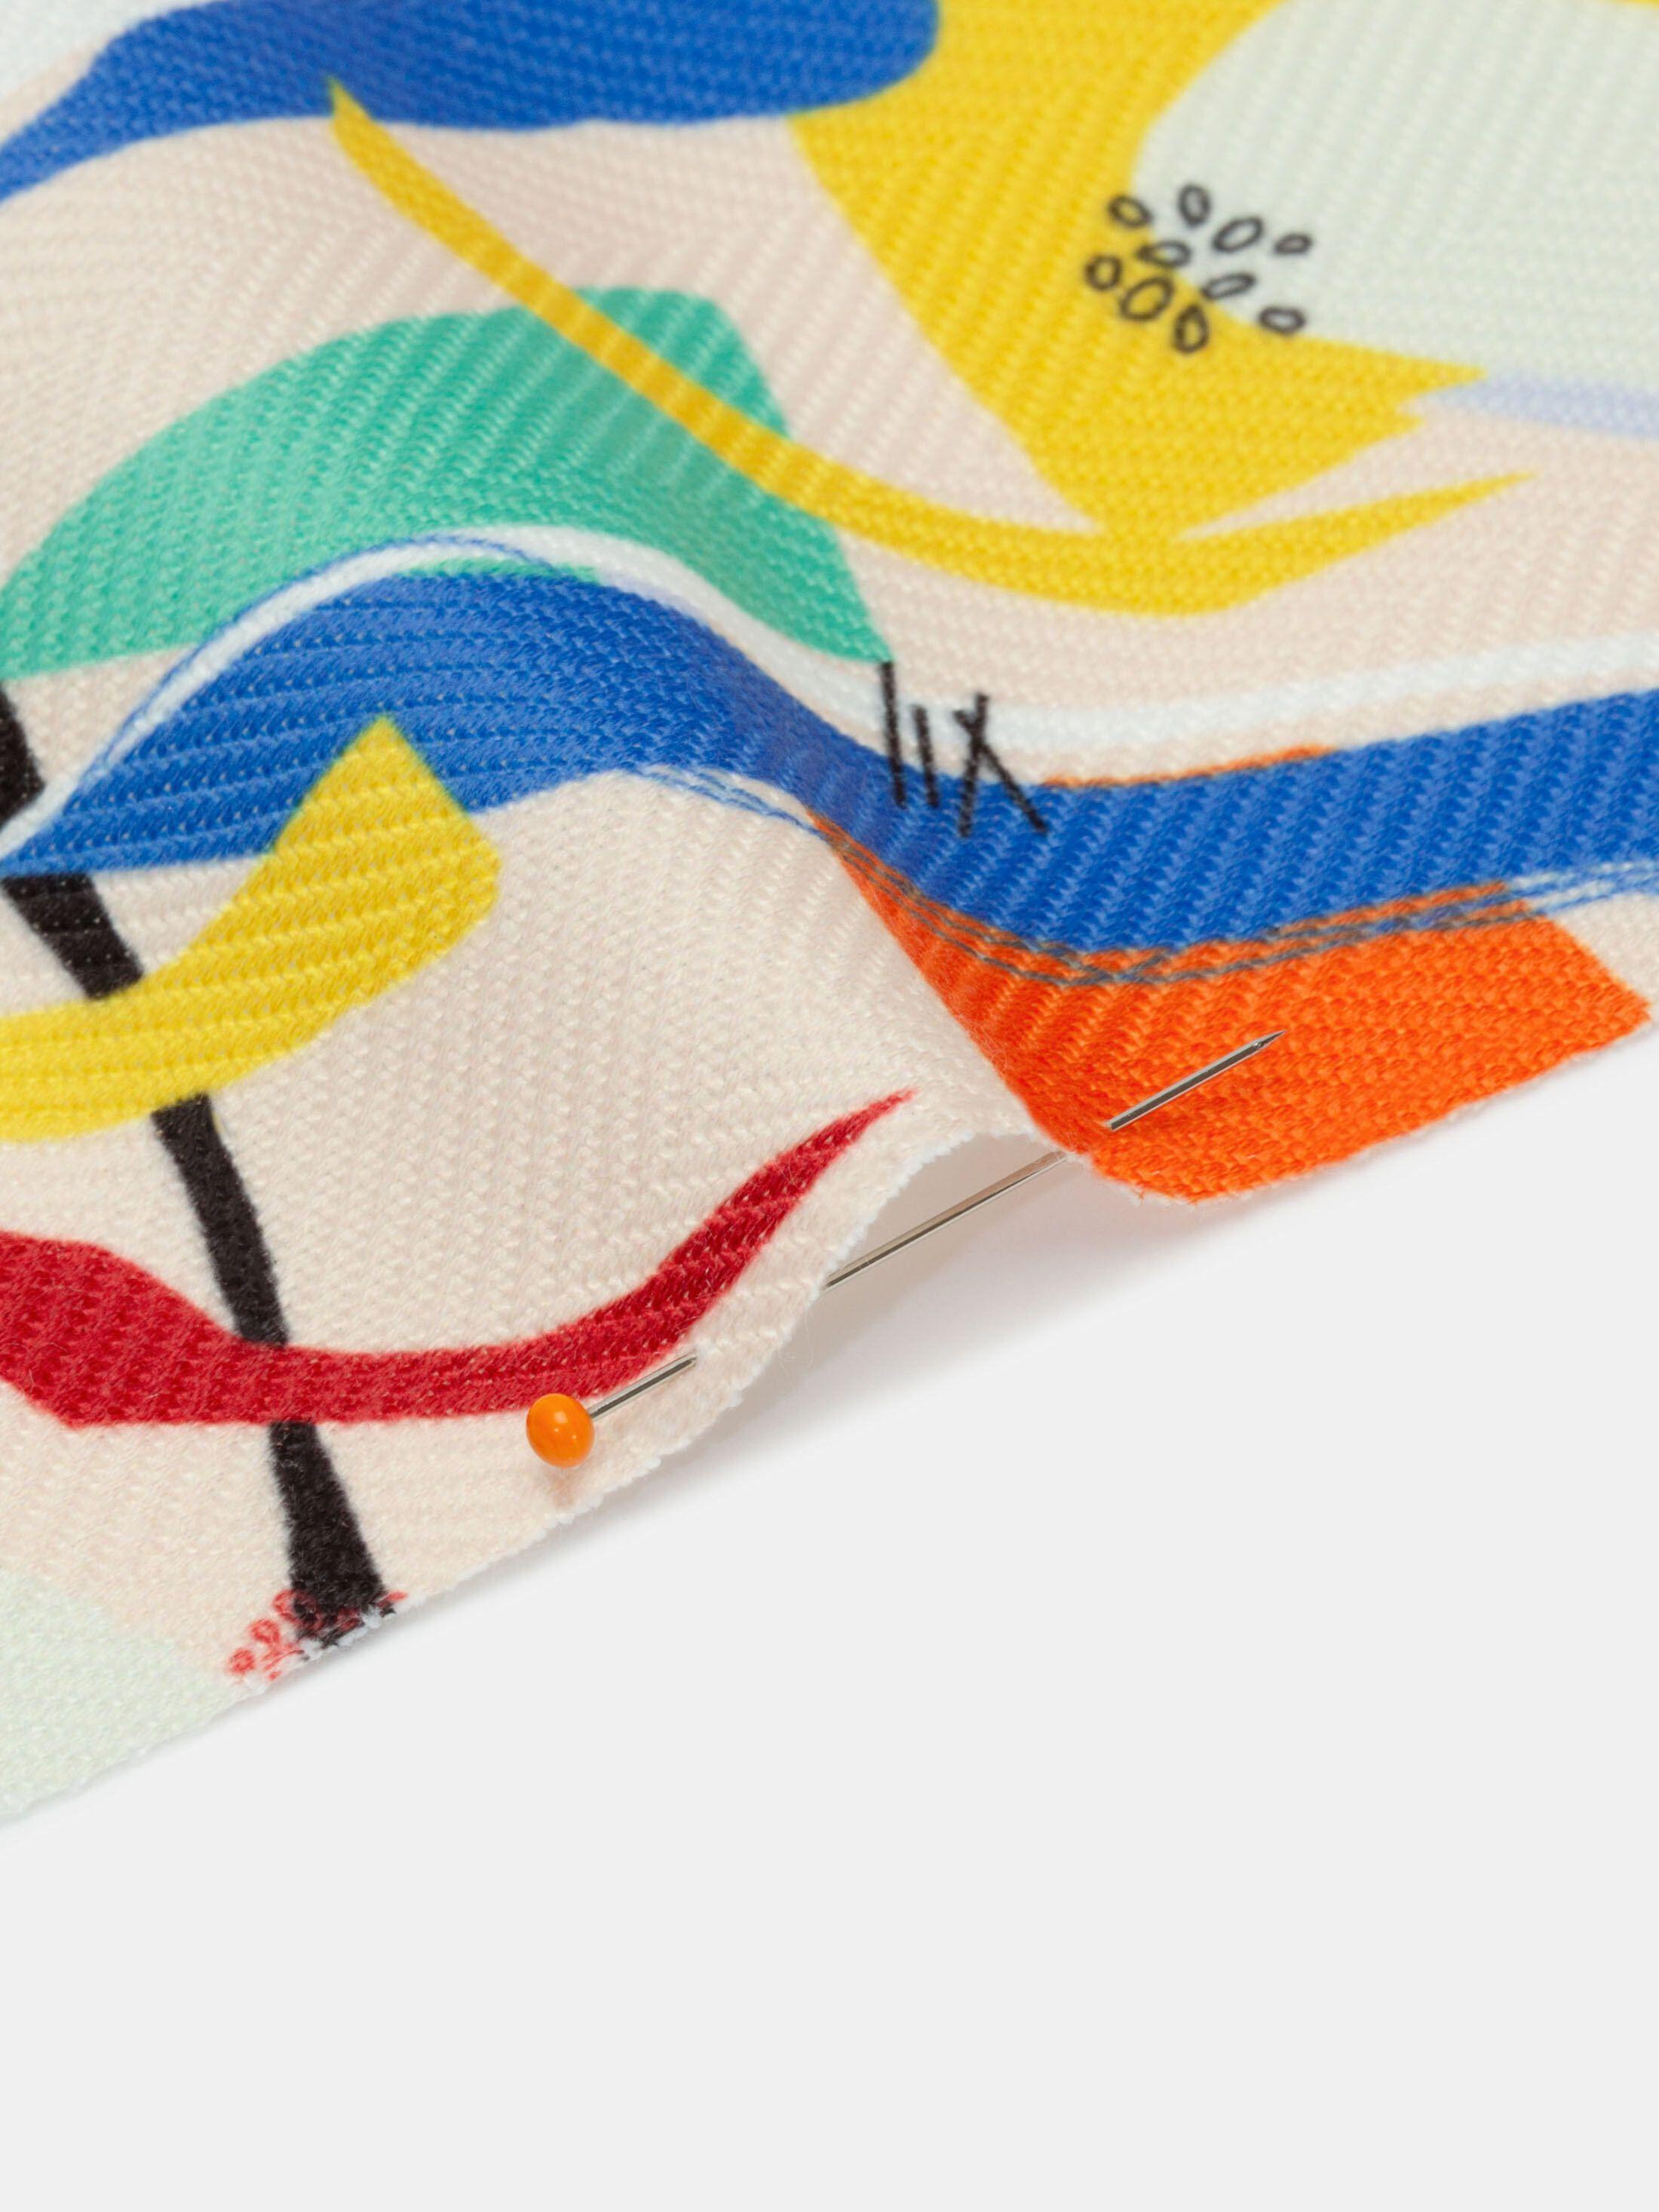 Digitaltryck på Mayfair textil